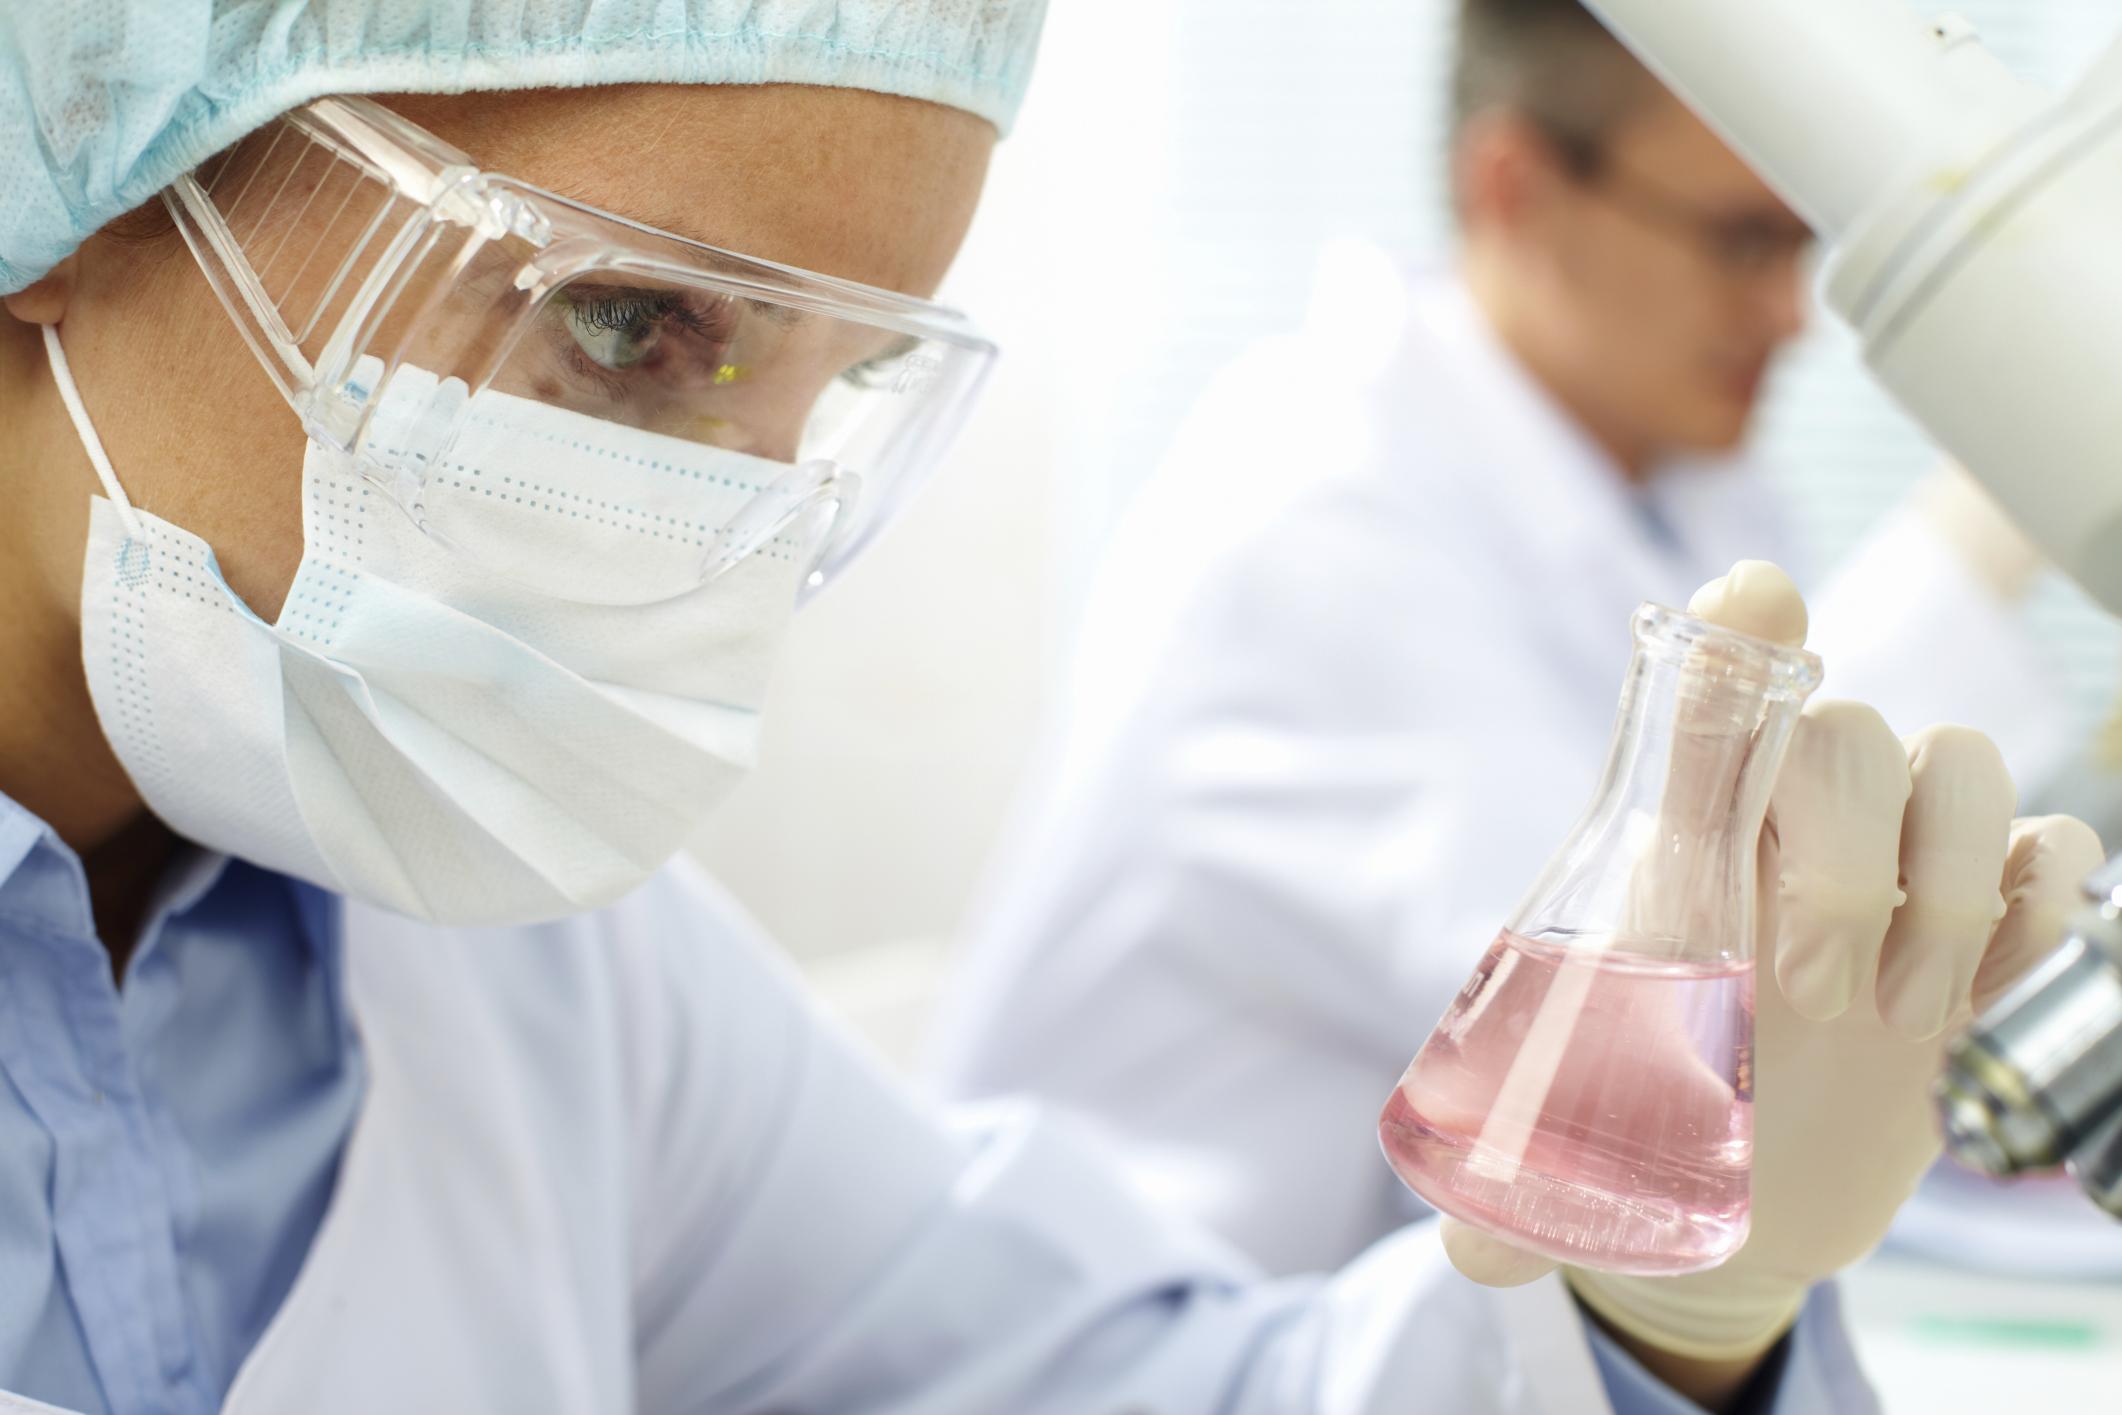 A biotech lab tech analyzing liquid in a beaker.